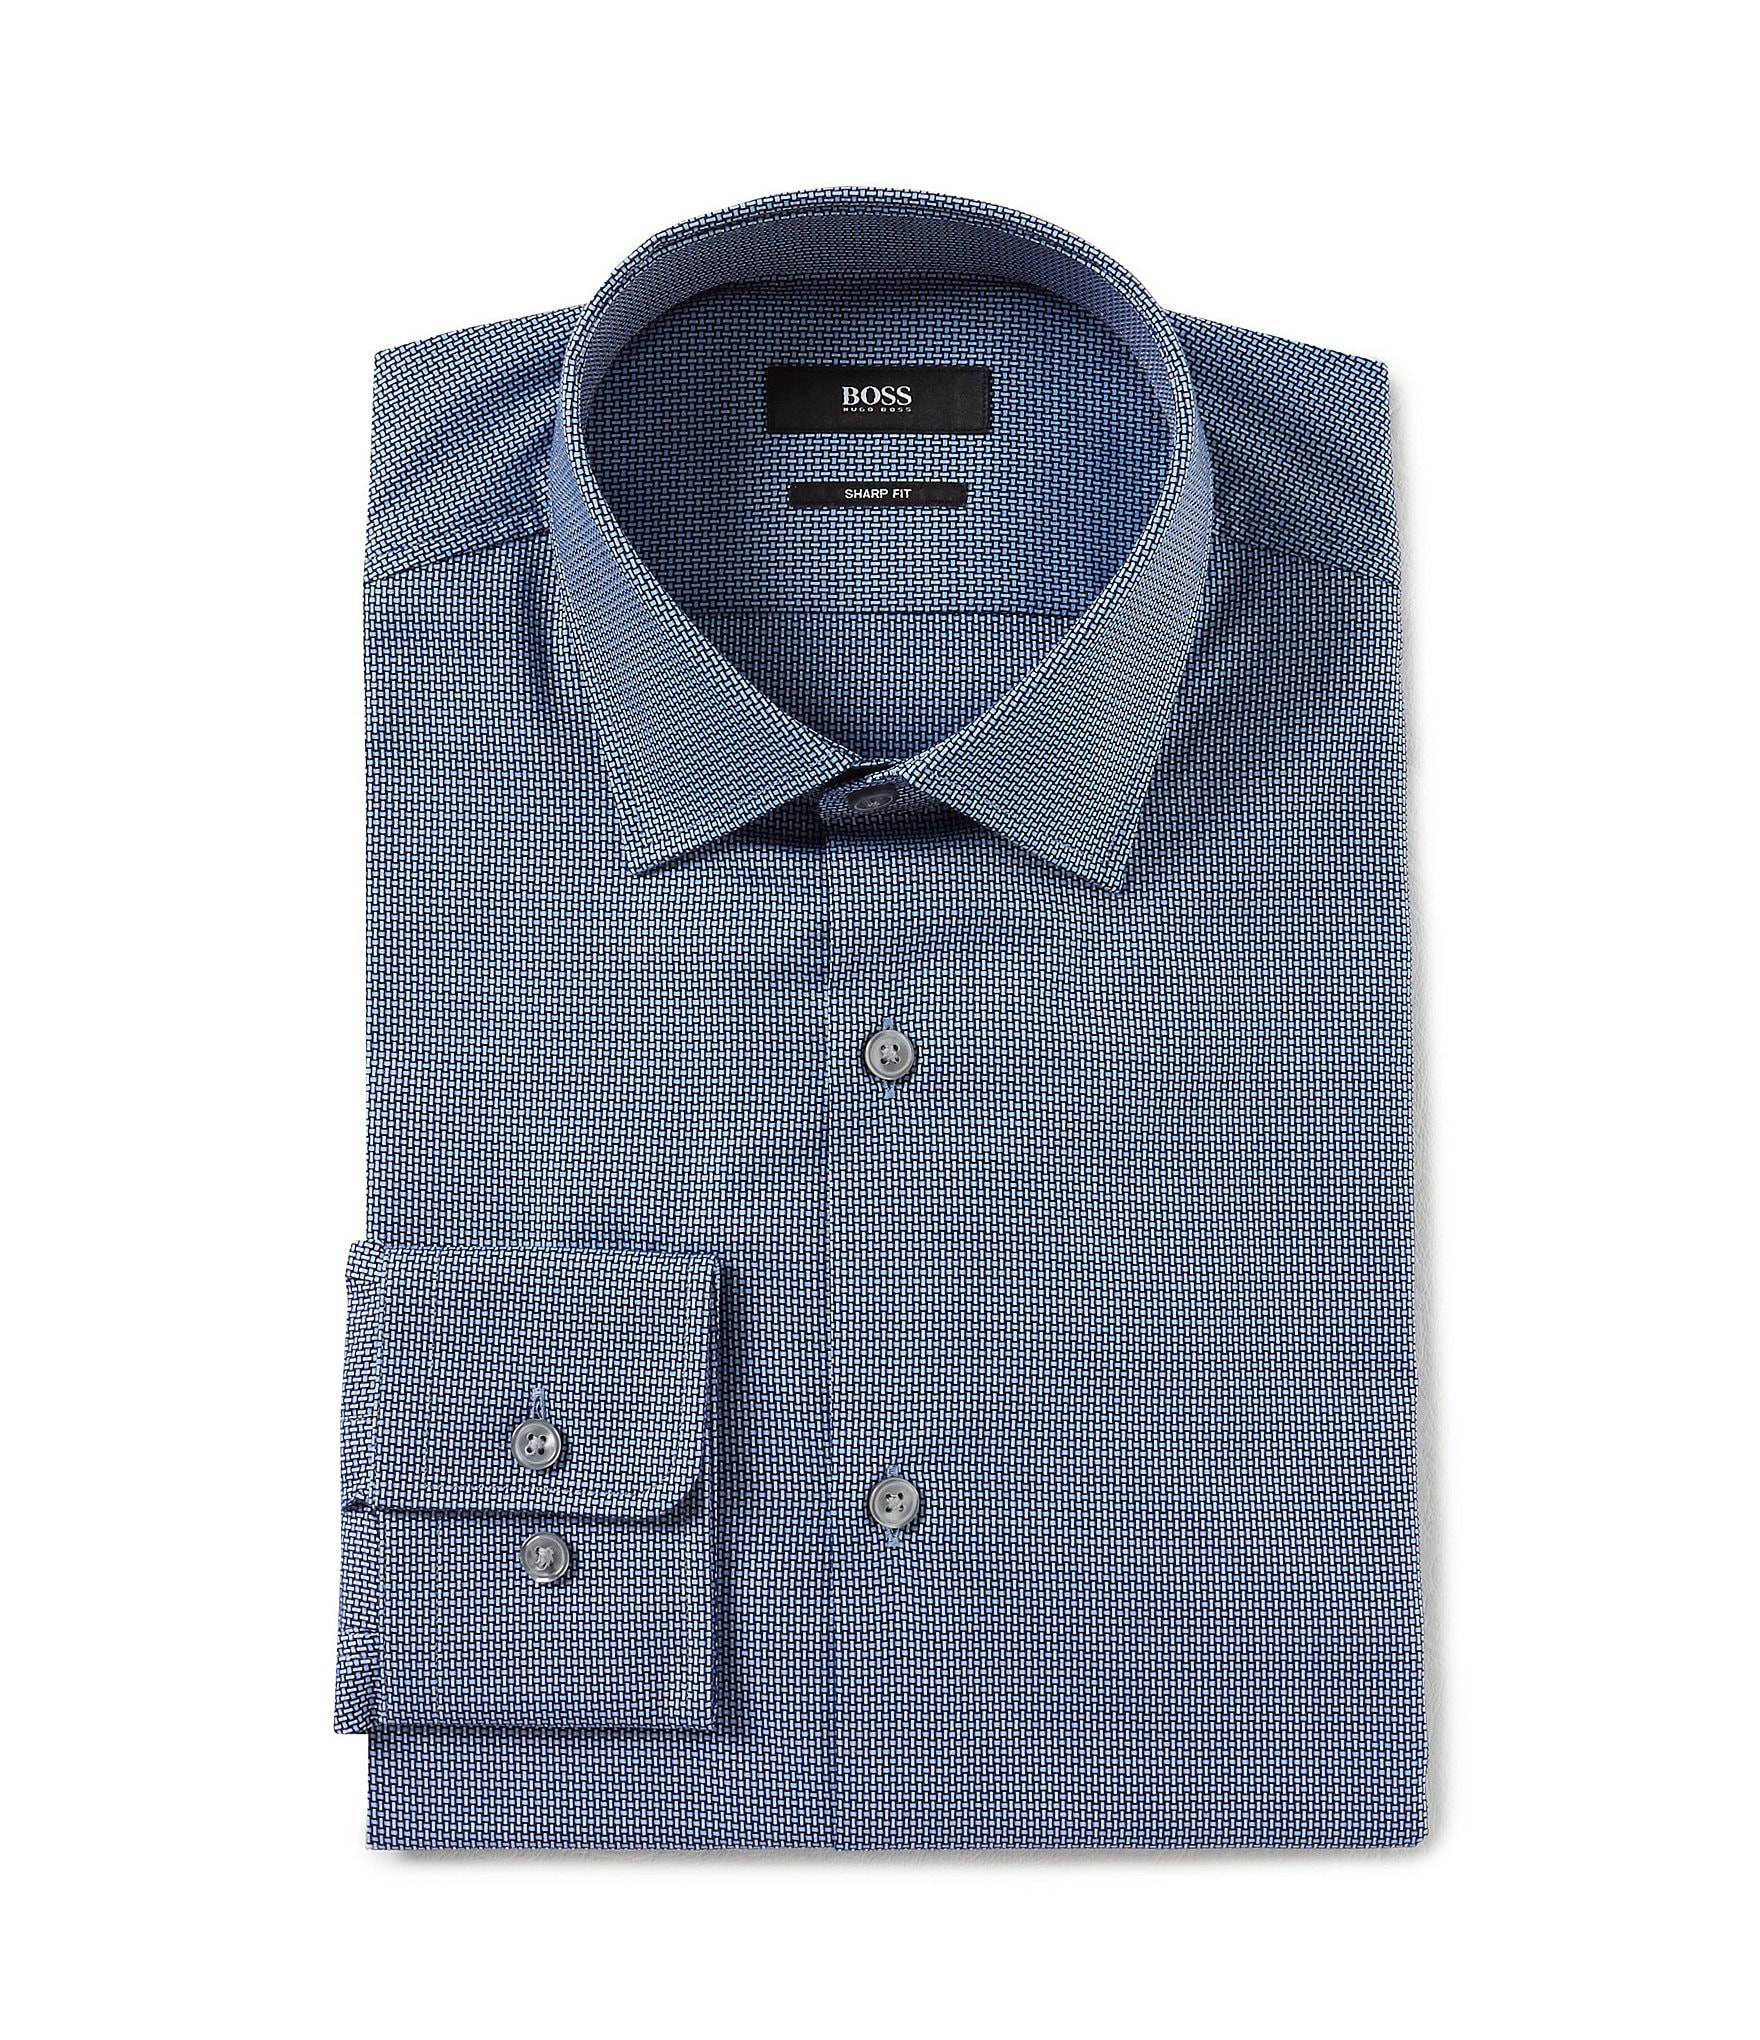 Hugo hugo boss sharp fit point collar solid dress shirt for Hugo boss dress shirt review